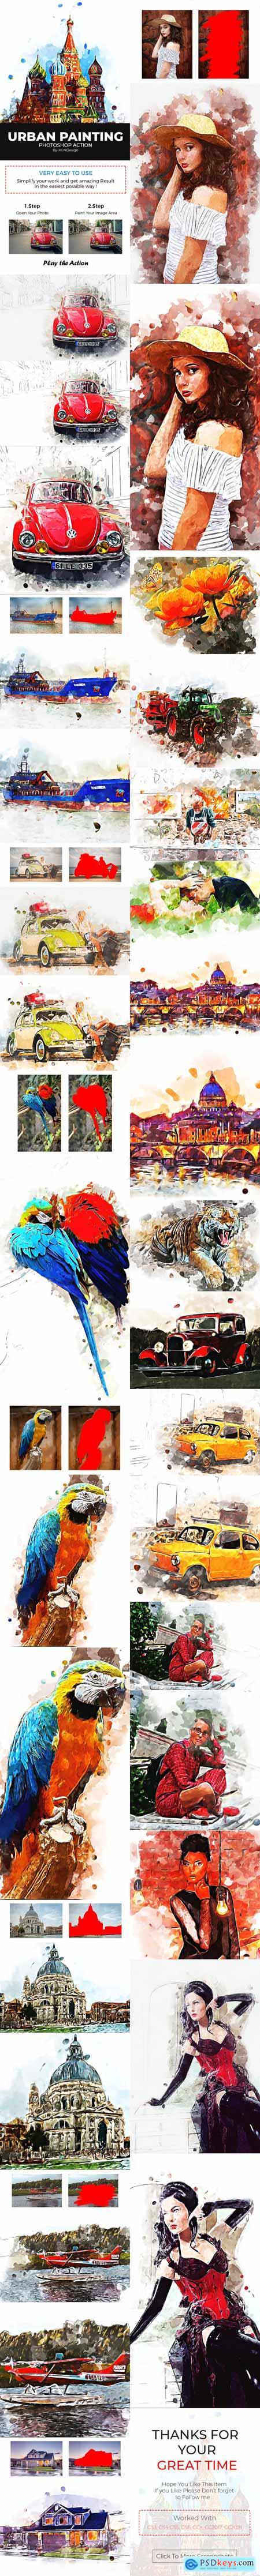 Urban Painting Photoshop Action 22230566